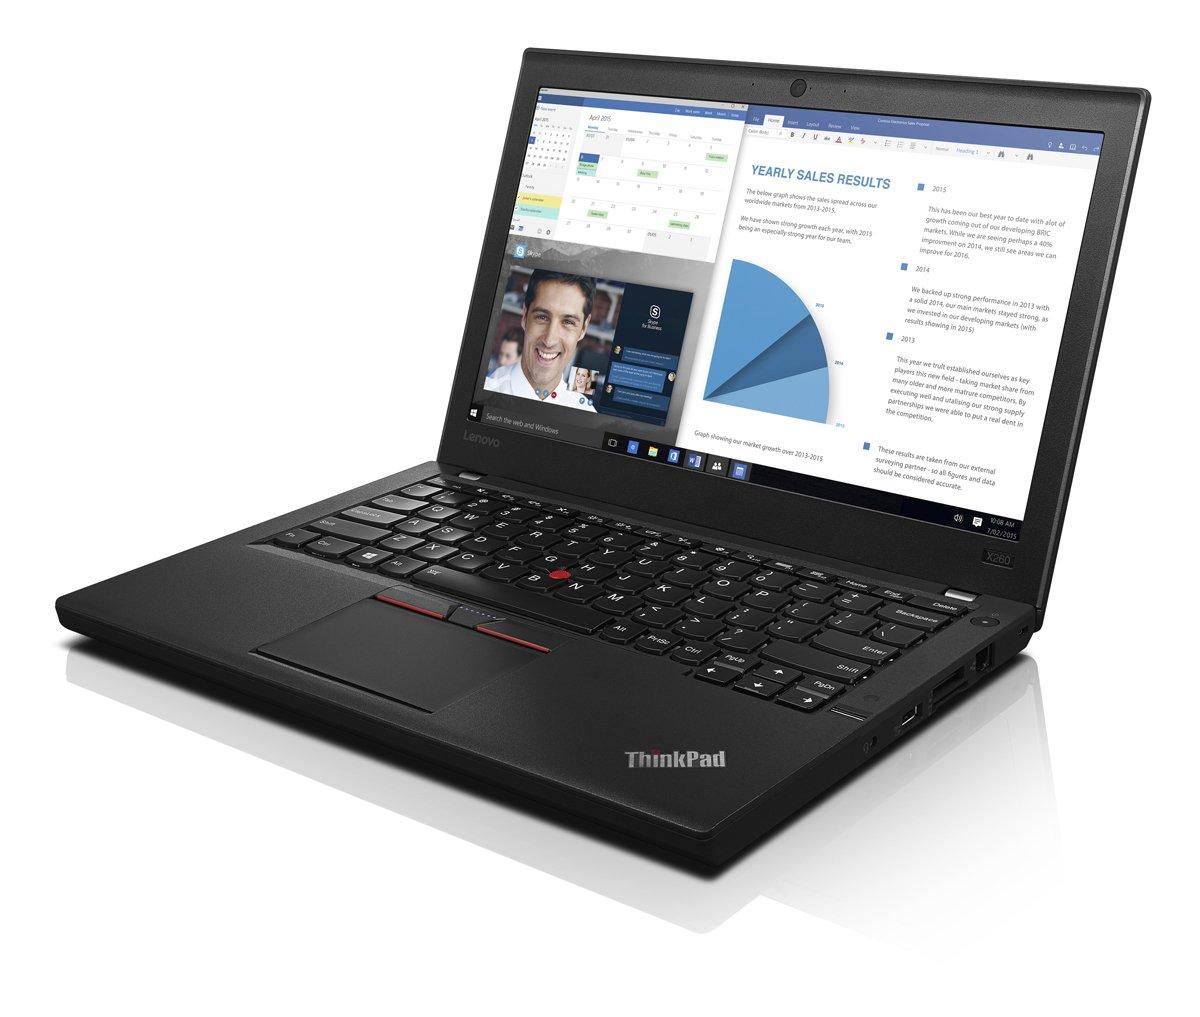 Lenovo ThinkPad X260 20F6005HUS Laptop Windows 7 Pro, Intel Core i5, 12.5 LED-Lit Screen, Storage 500 GB, RAM 8 GB Black